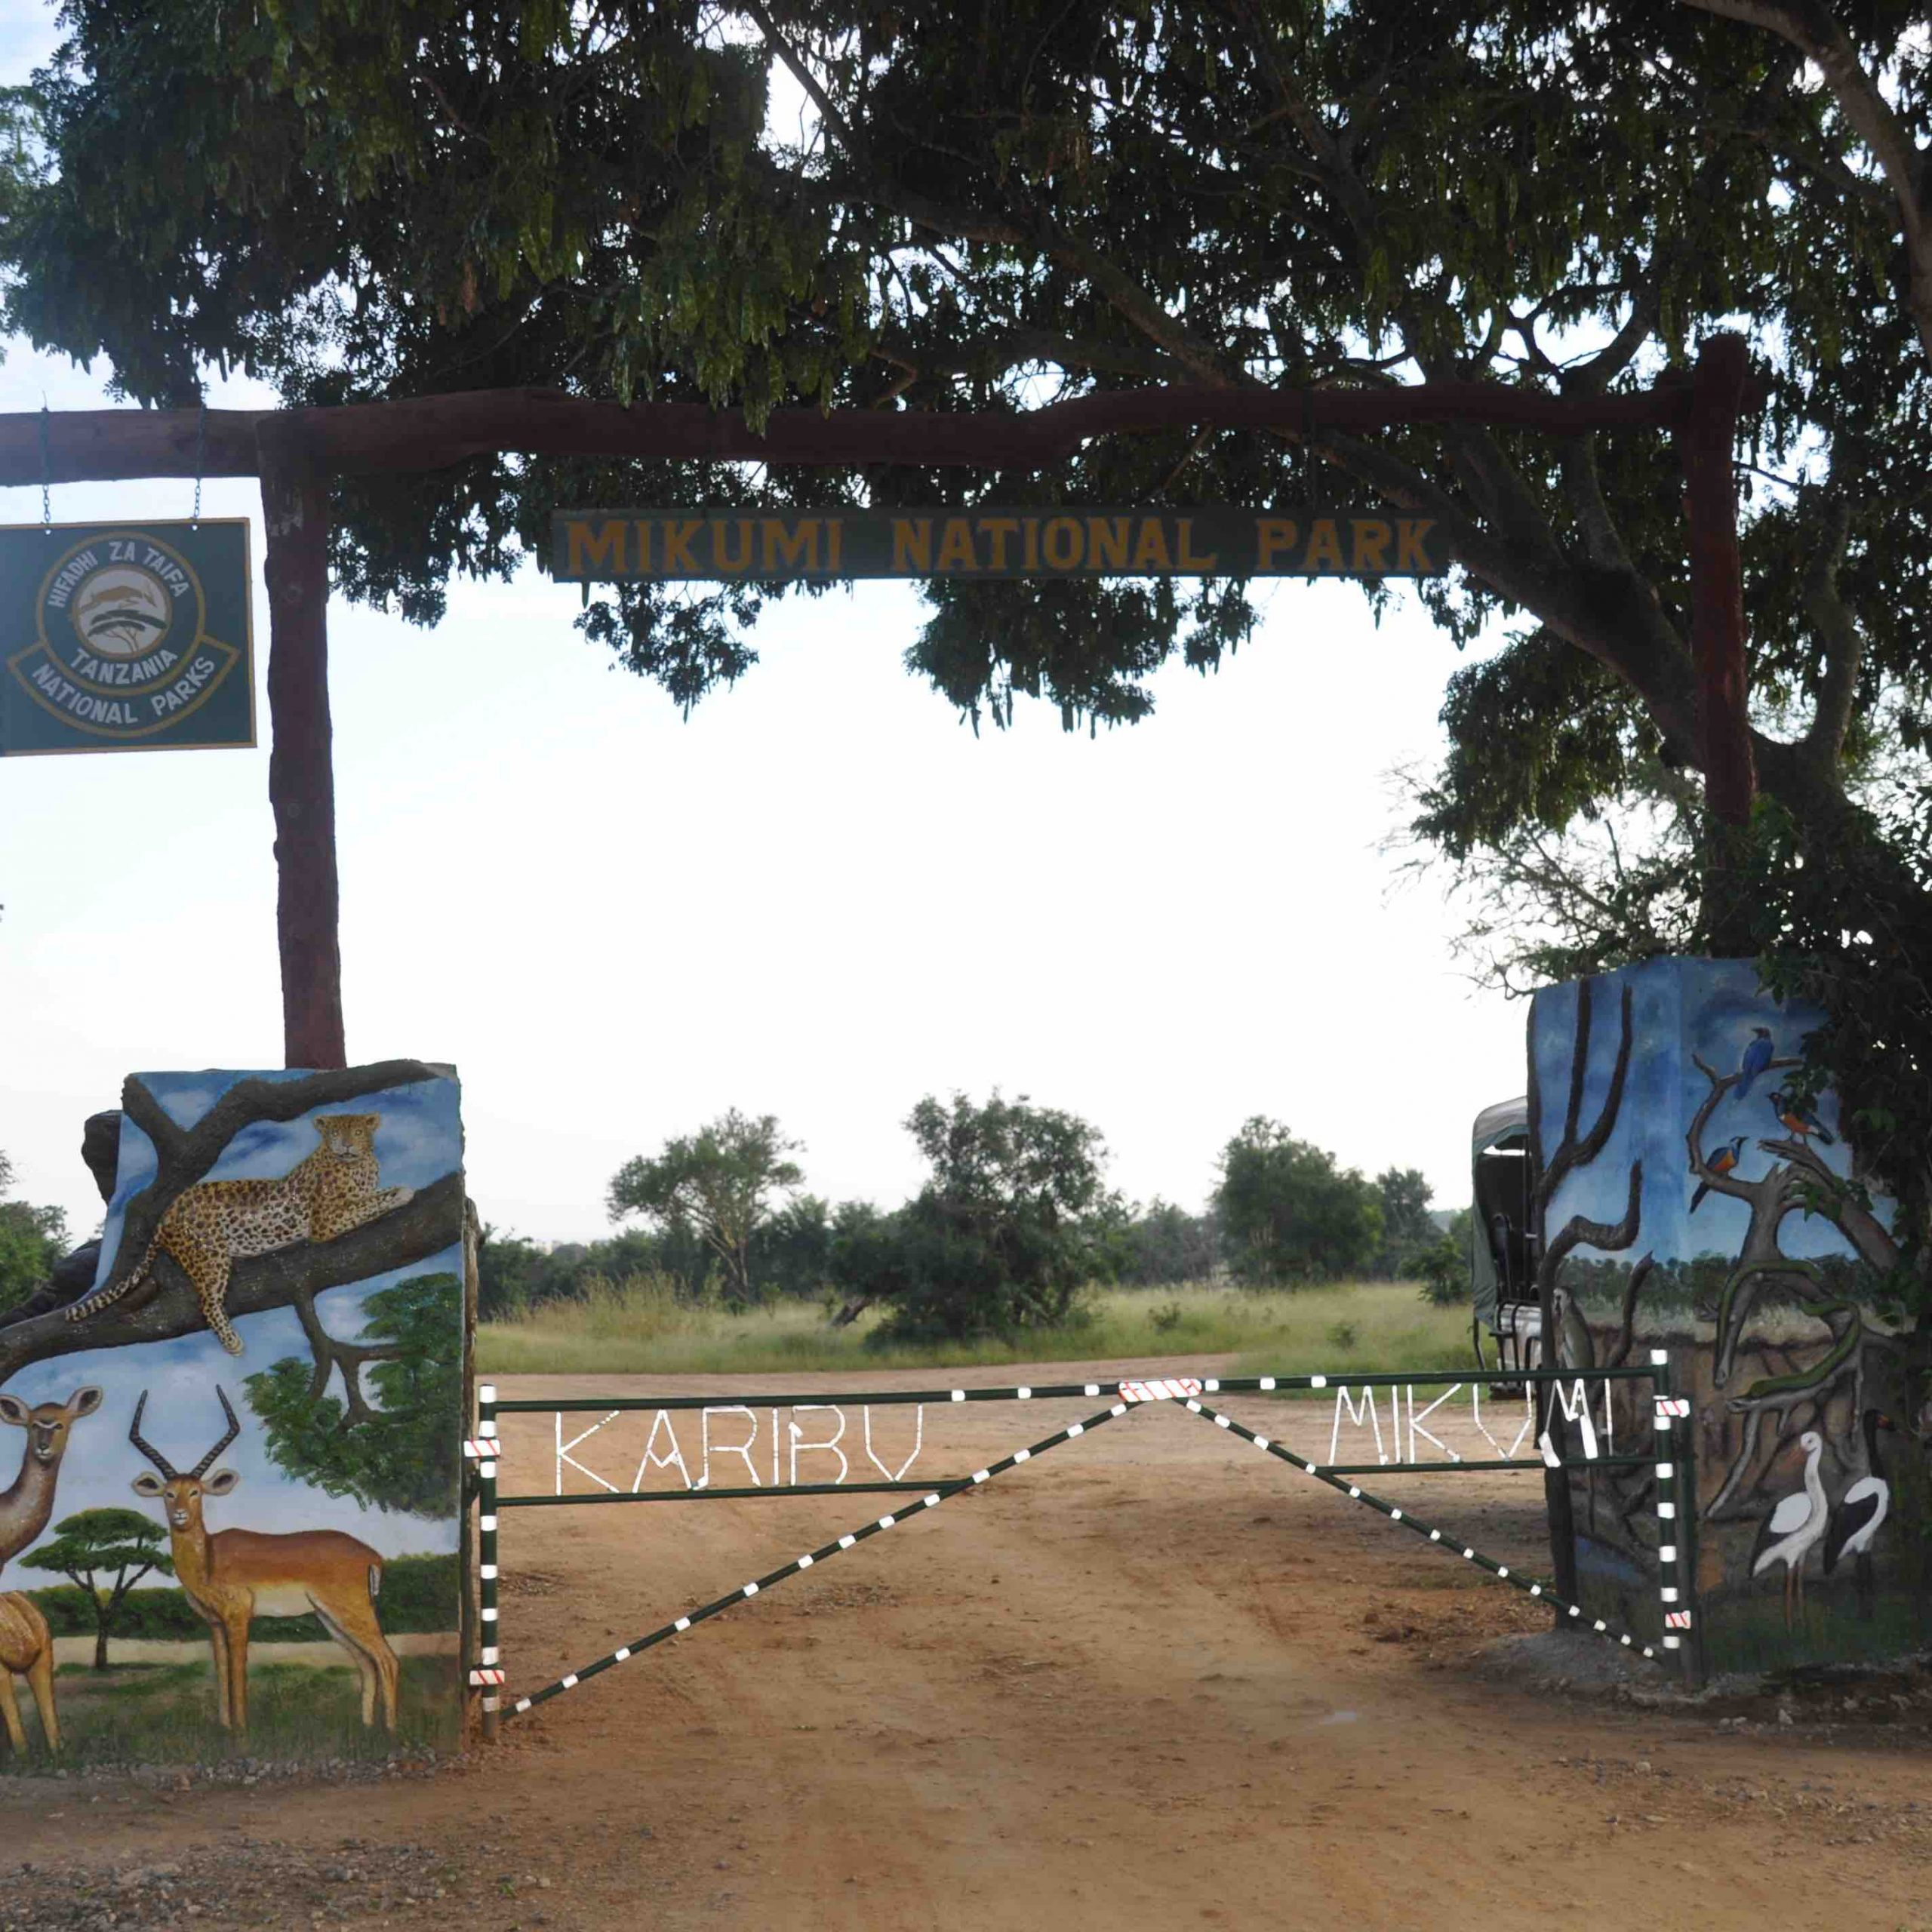 mikumi entrance gate